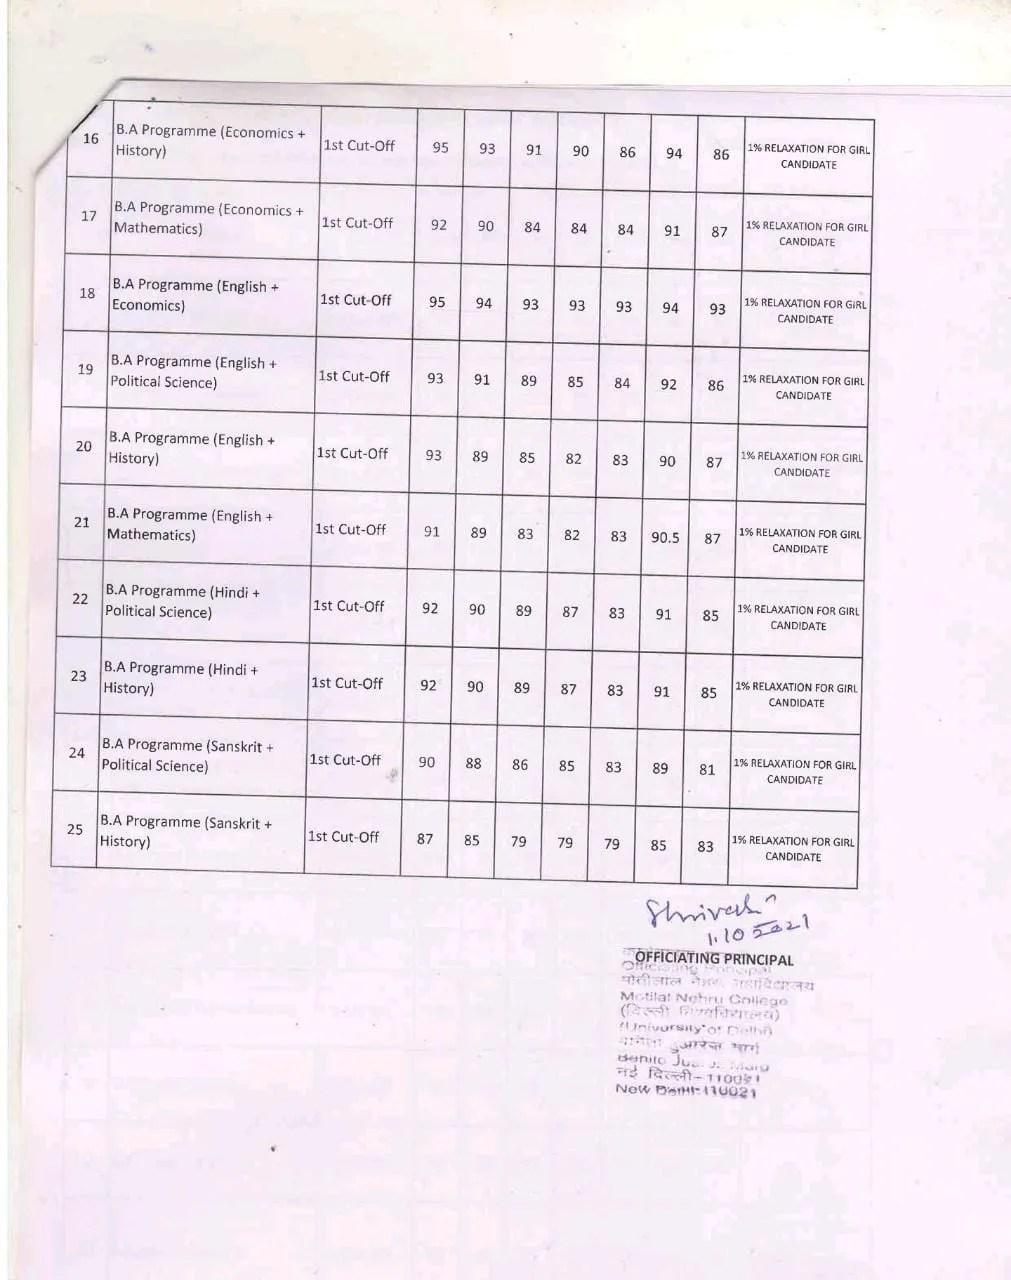 Motilal Nehru college cut off 2021 (Page 2)